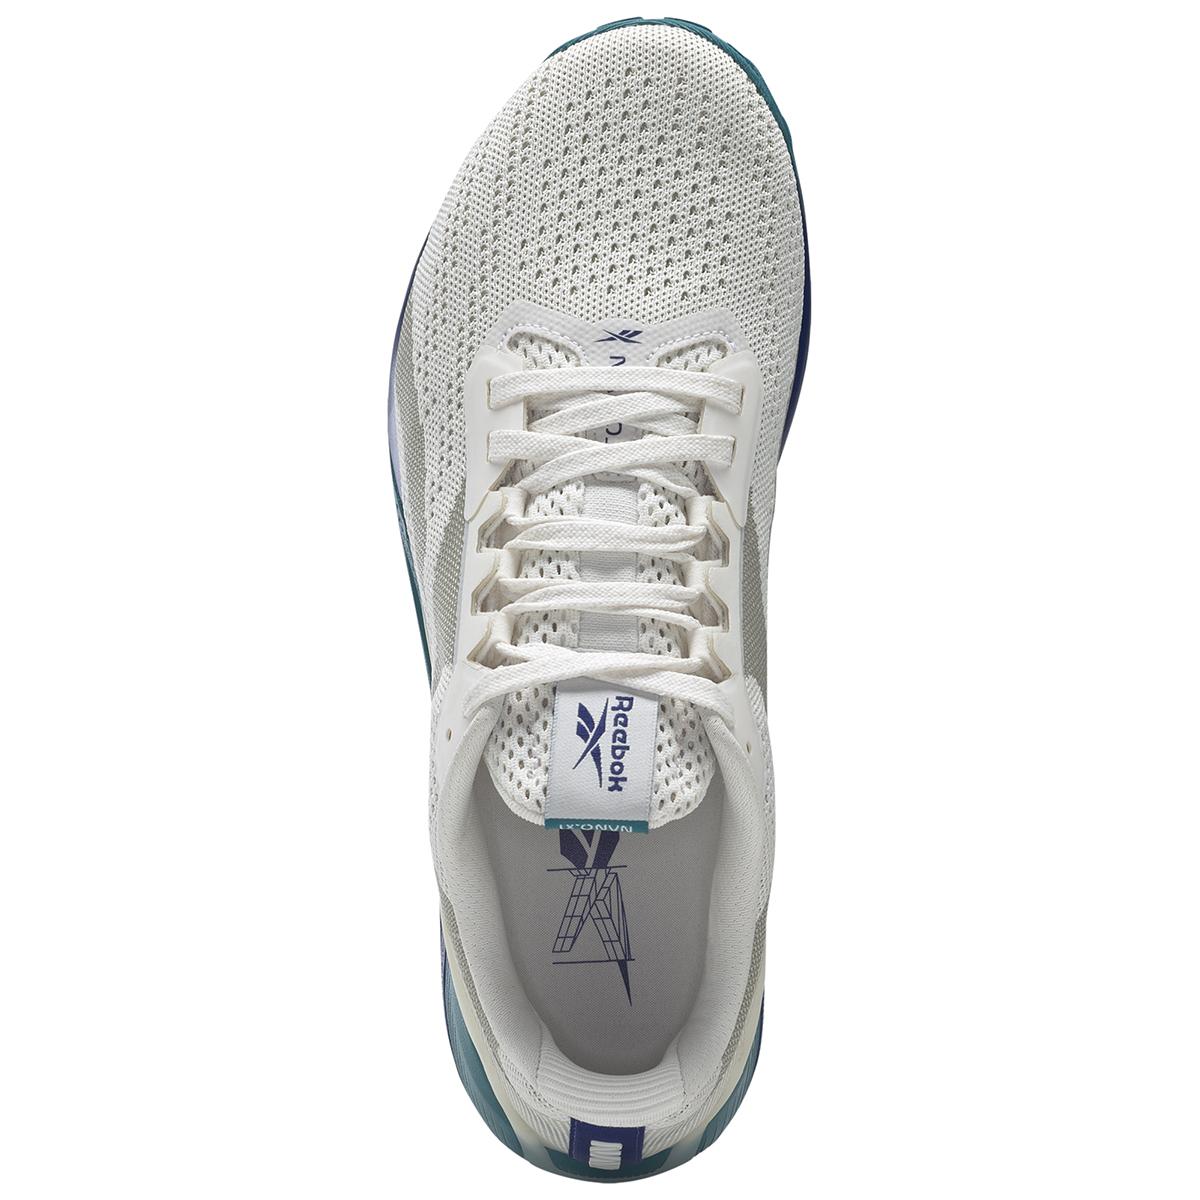 Men's Reebok Nano X1 Training Shoe - Color: Chalk/Classic Cobalt/Seaport Teal   - Size: 6 - Width: Regular, Chalk/Classic Cobalt/Seaport Teal, large, image 3